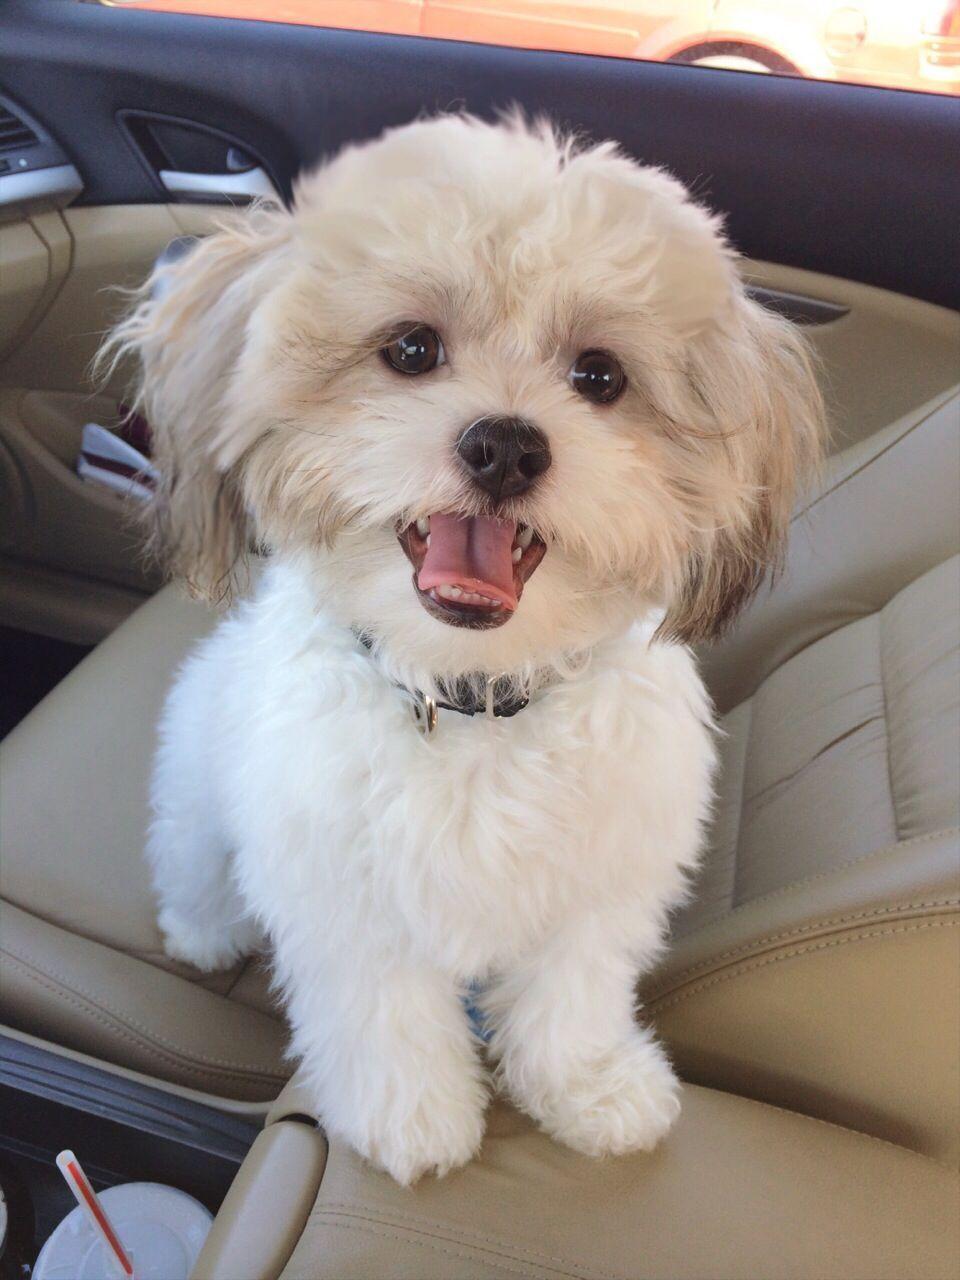 My Maltese Shih Tzu Mix Shih Tzu Terrier Mix Maltese Shih Tzu Puppies Shih Tzu